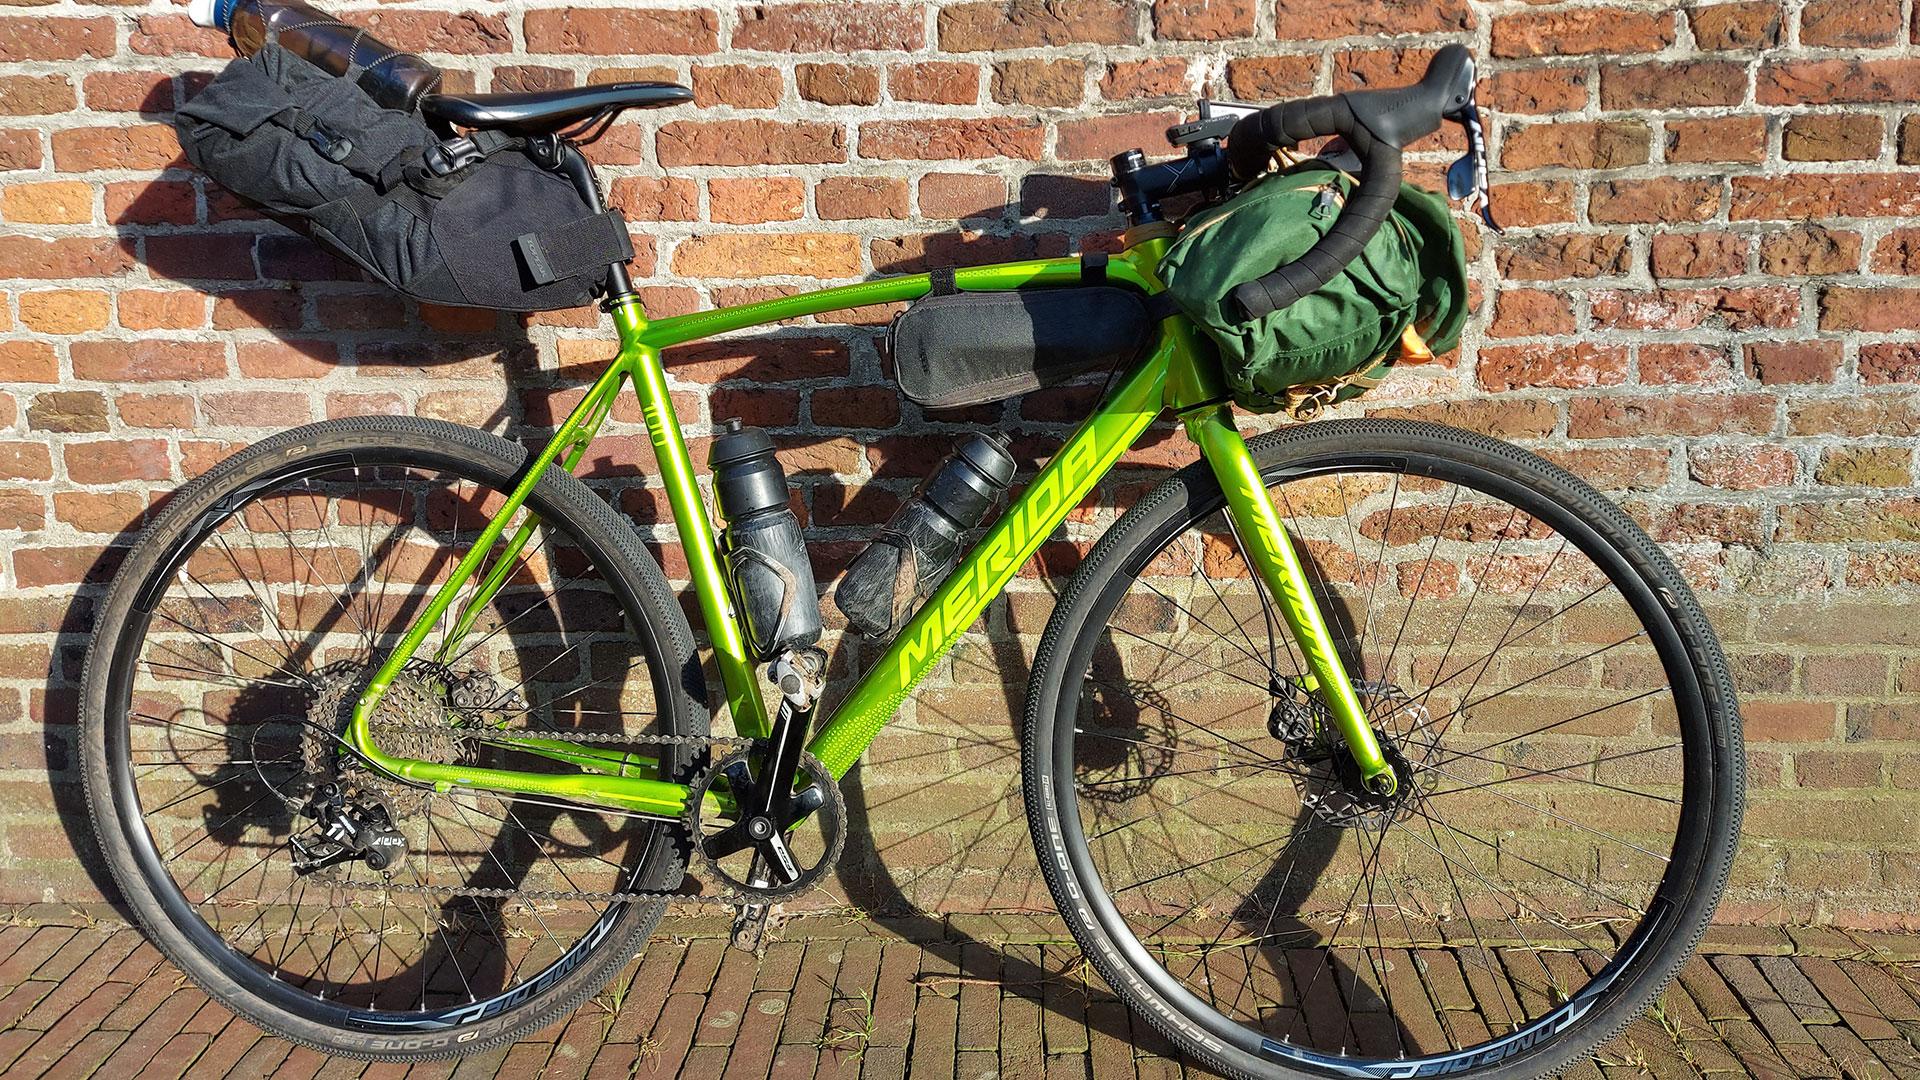 Bikepacking in Nederland, hoe pak je dat aan?